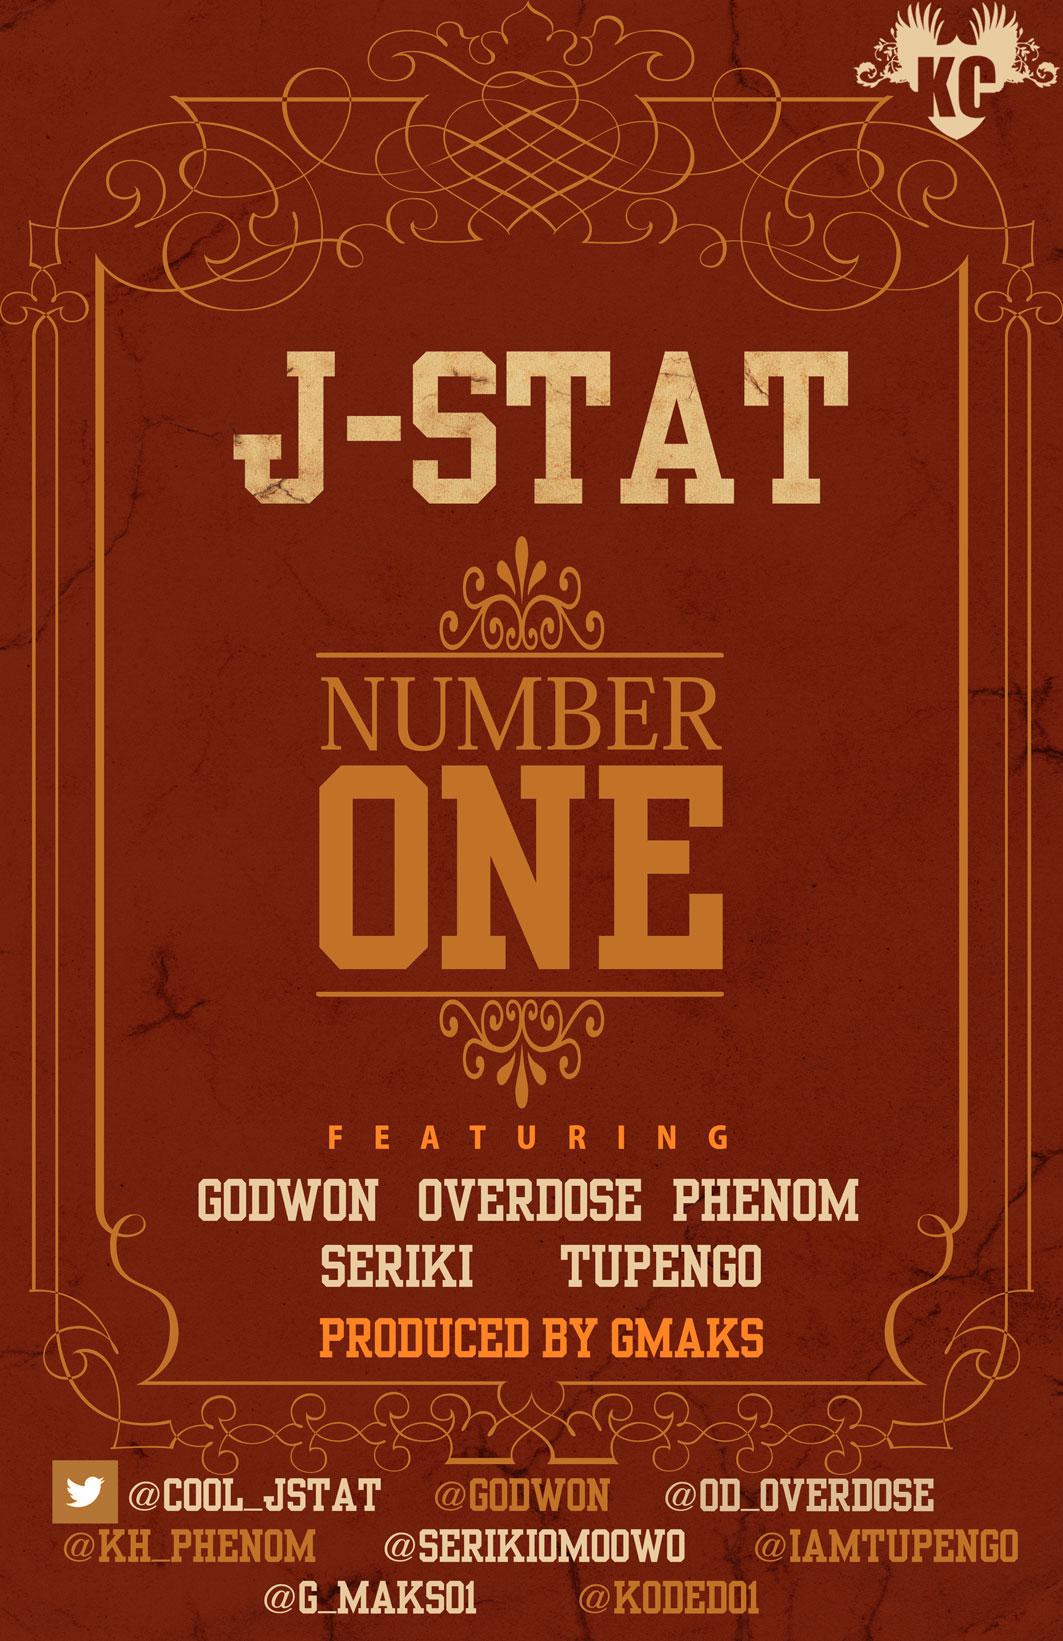 J-Stat ft. OverDose, Godwon, Seriki, Tupengo 'n' Phenom - NUMBER ONE [prod. by G-Maks] Artwork | AceWorldTeam.com